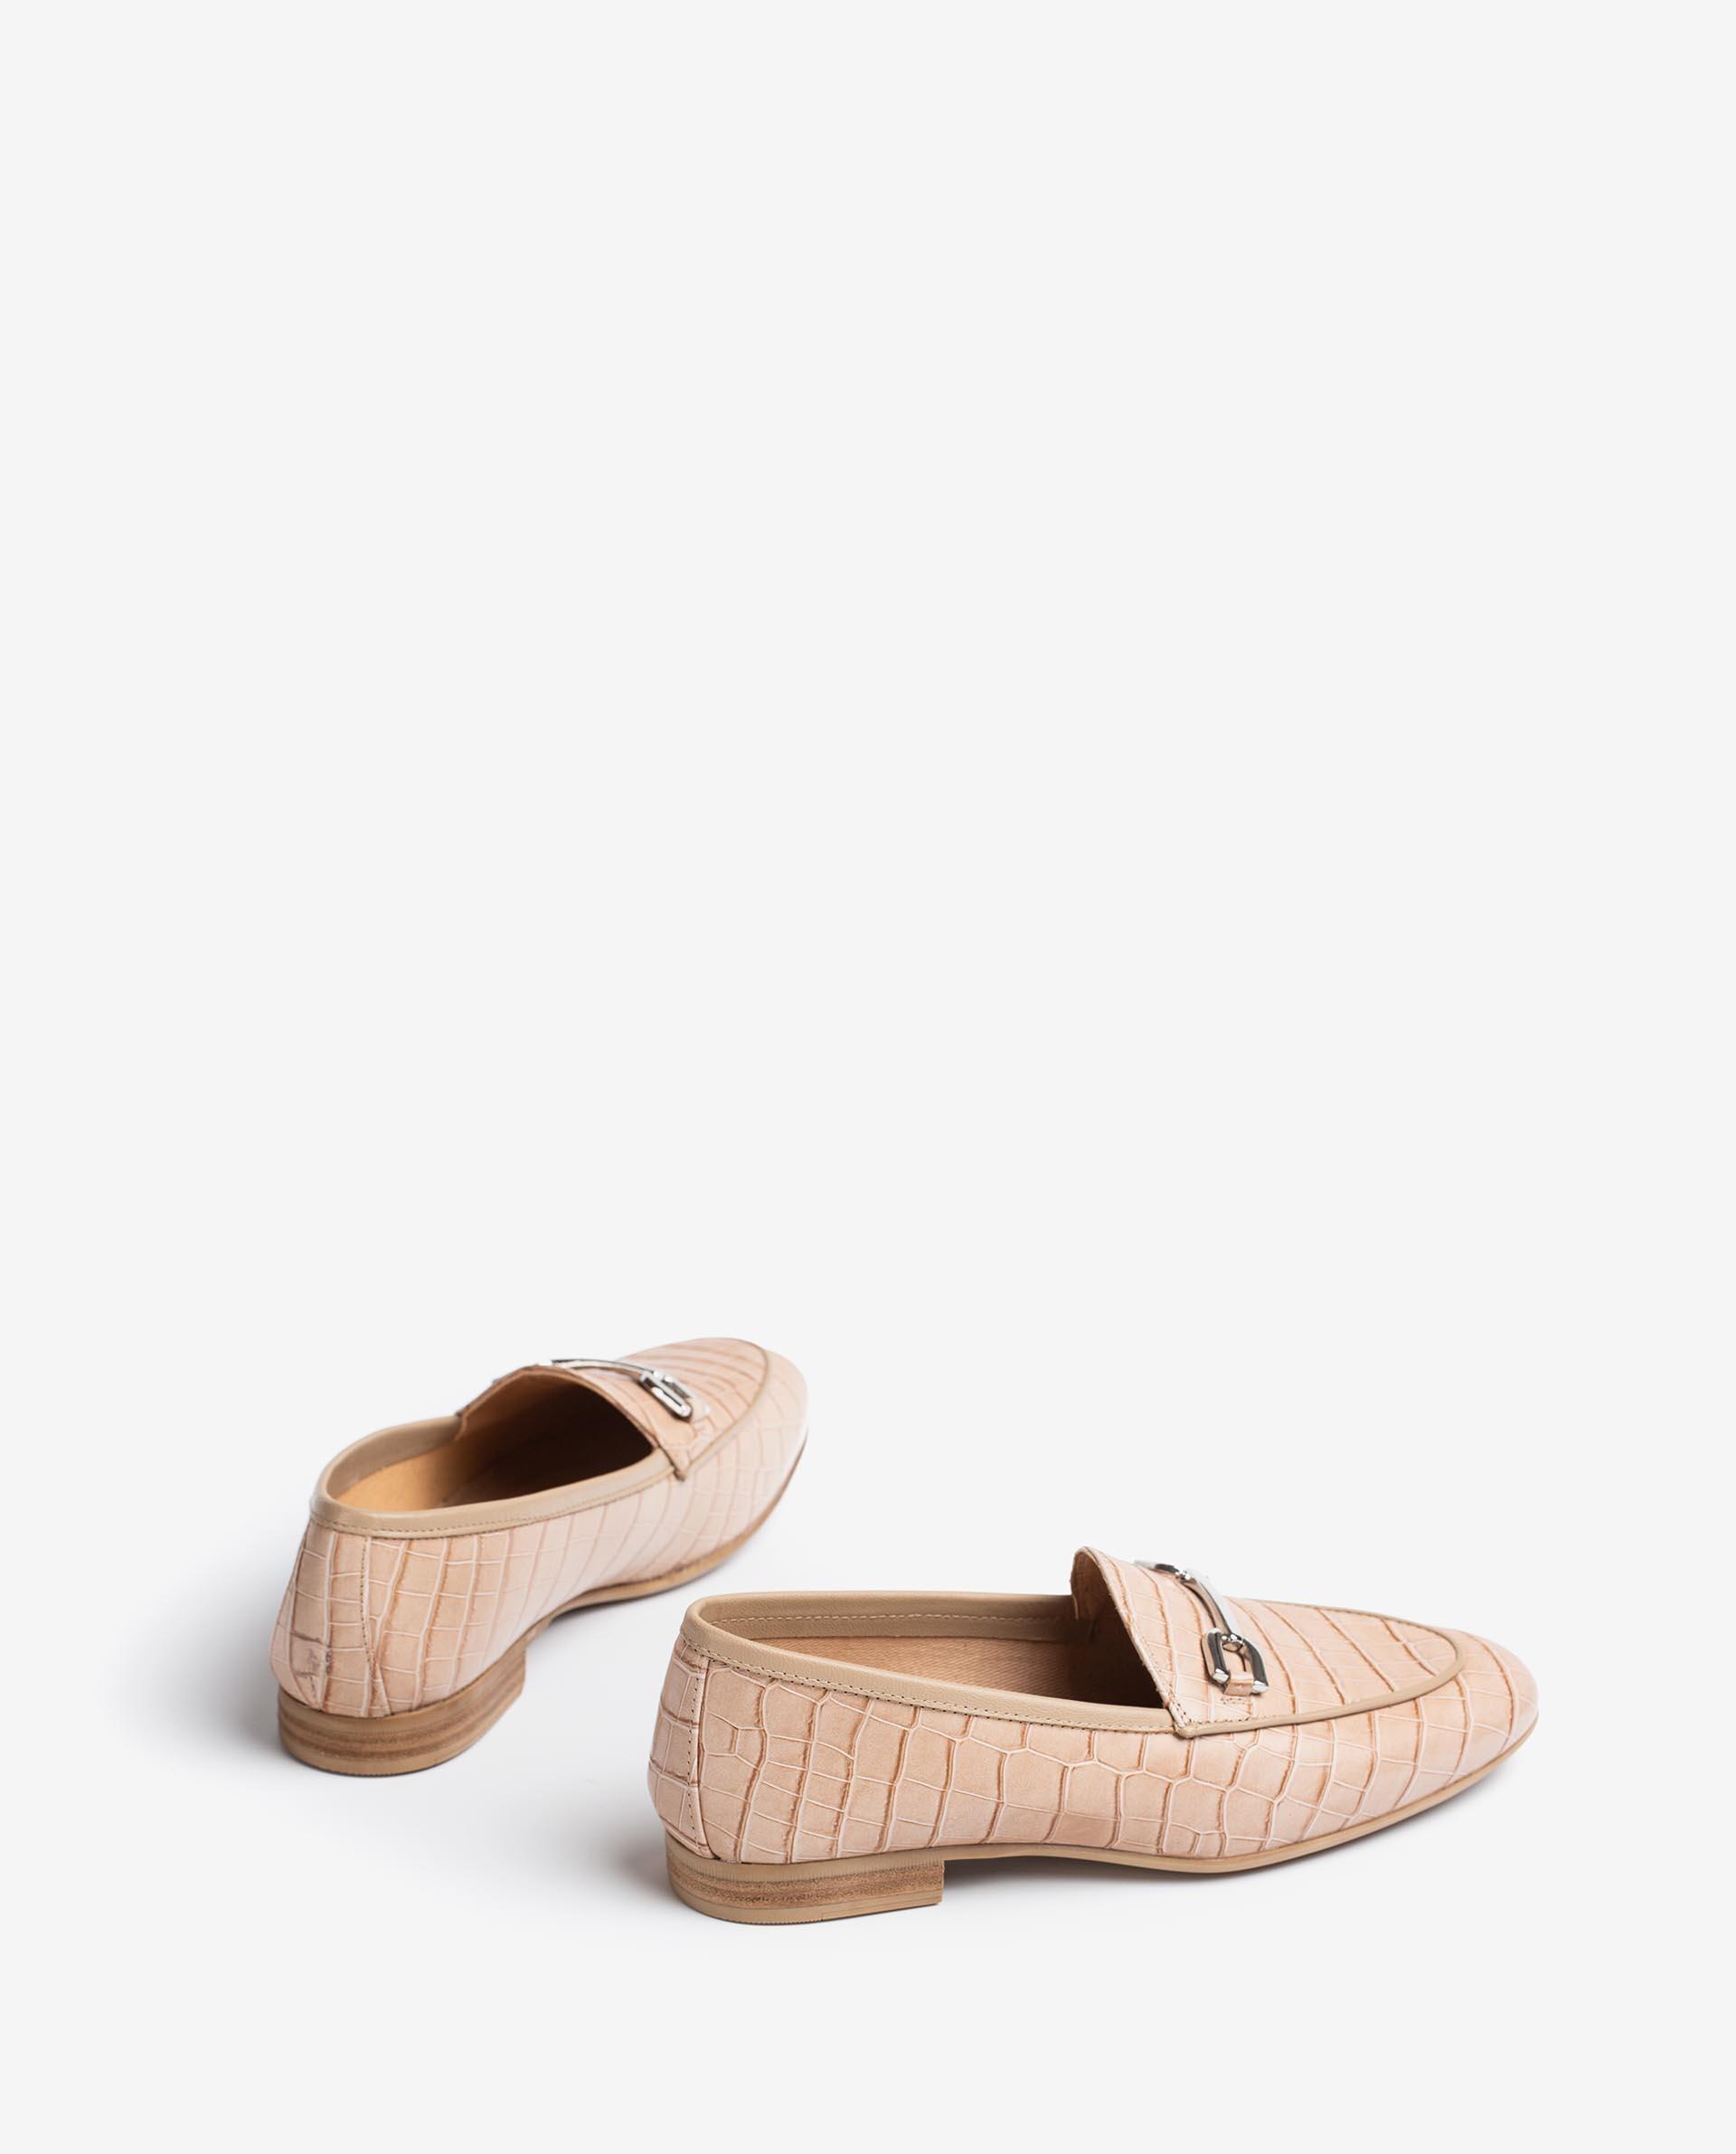 Unisa Loafers DALCY_21_LAU nude